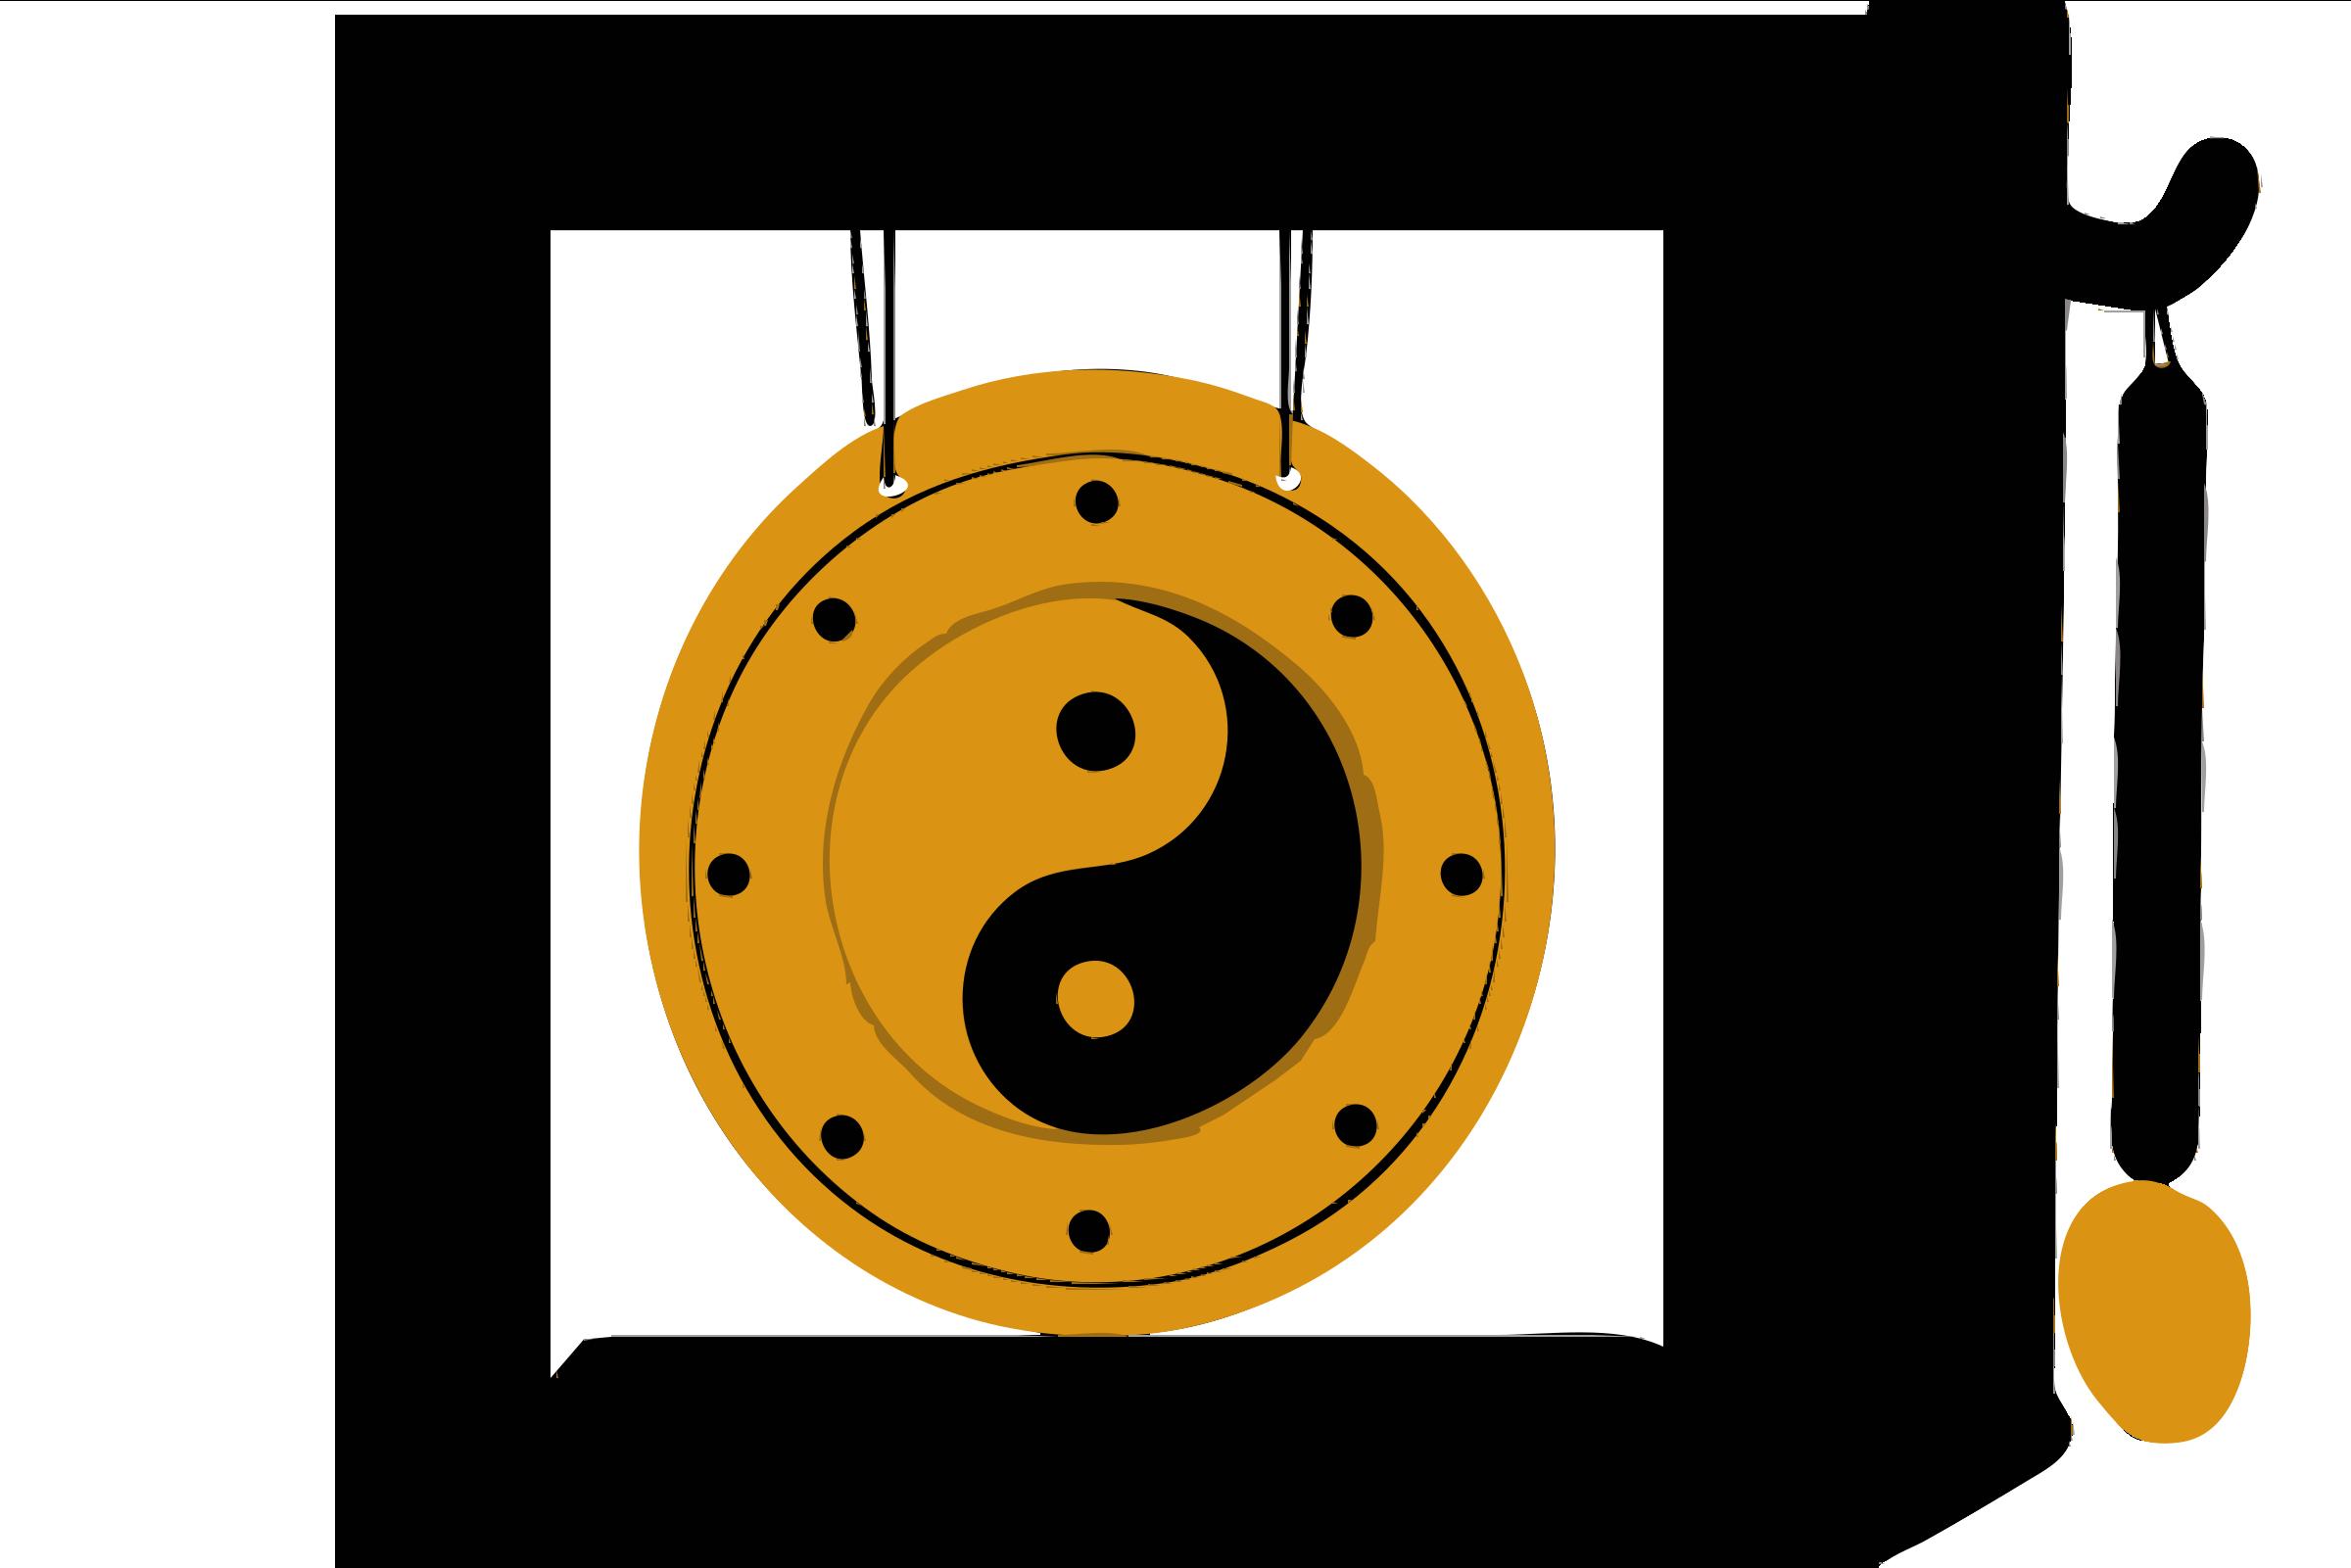 Gong Clipart.